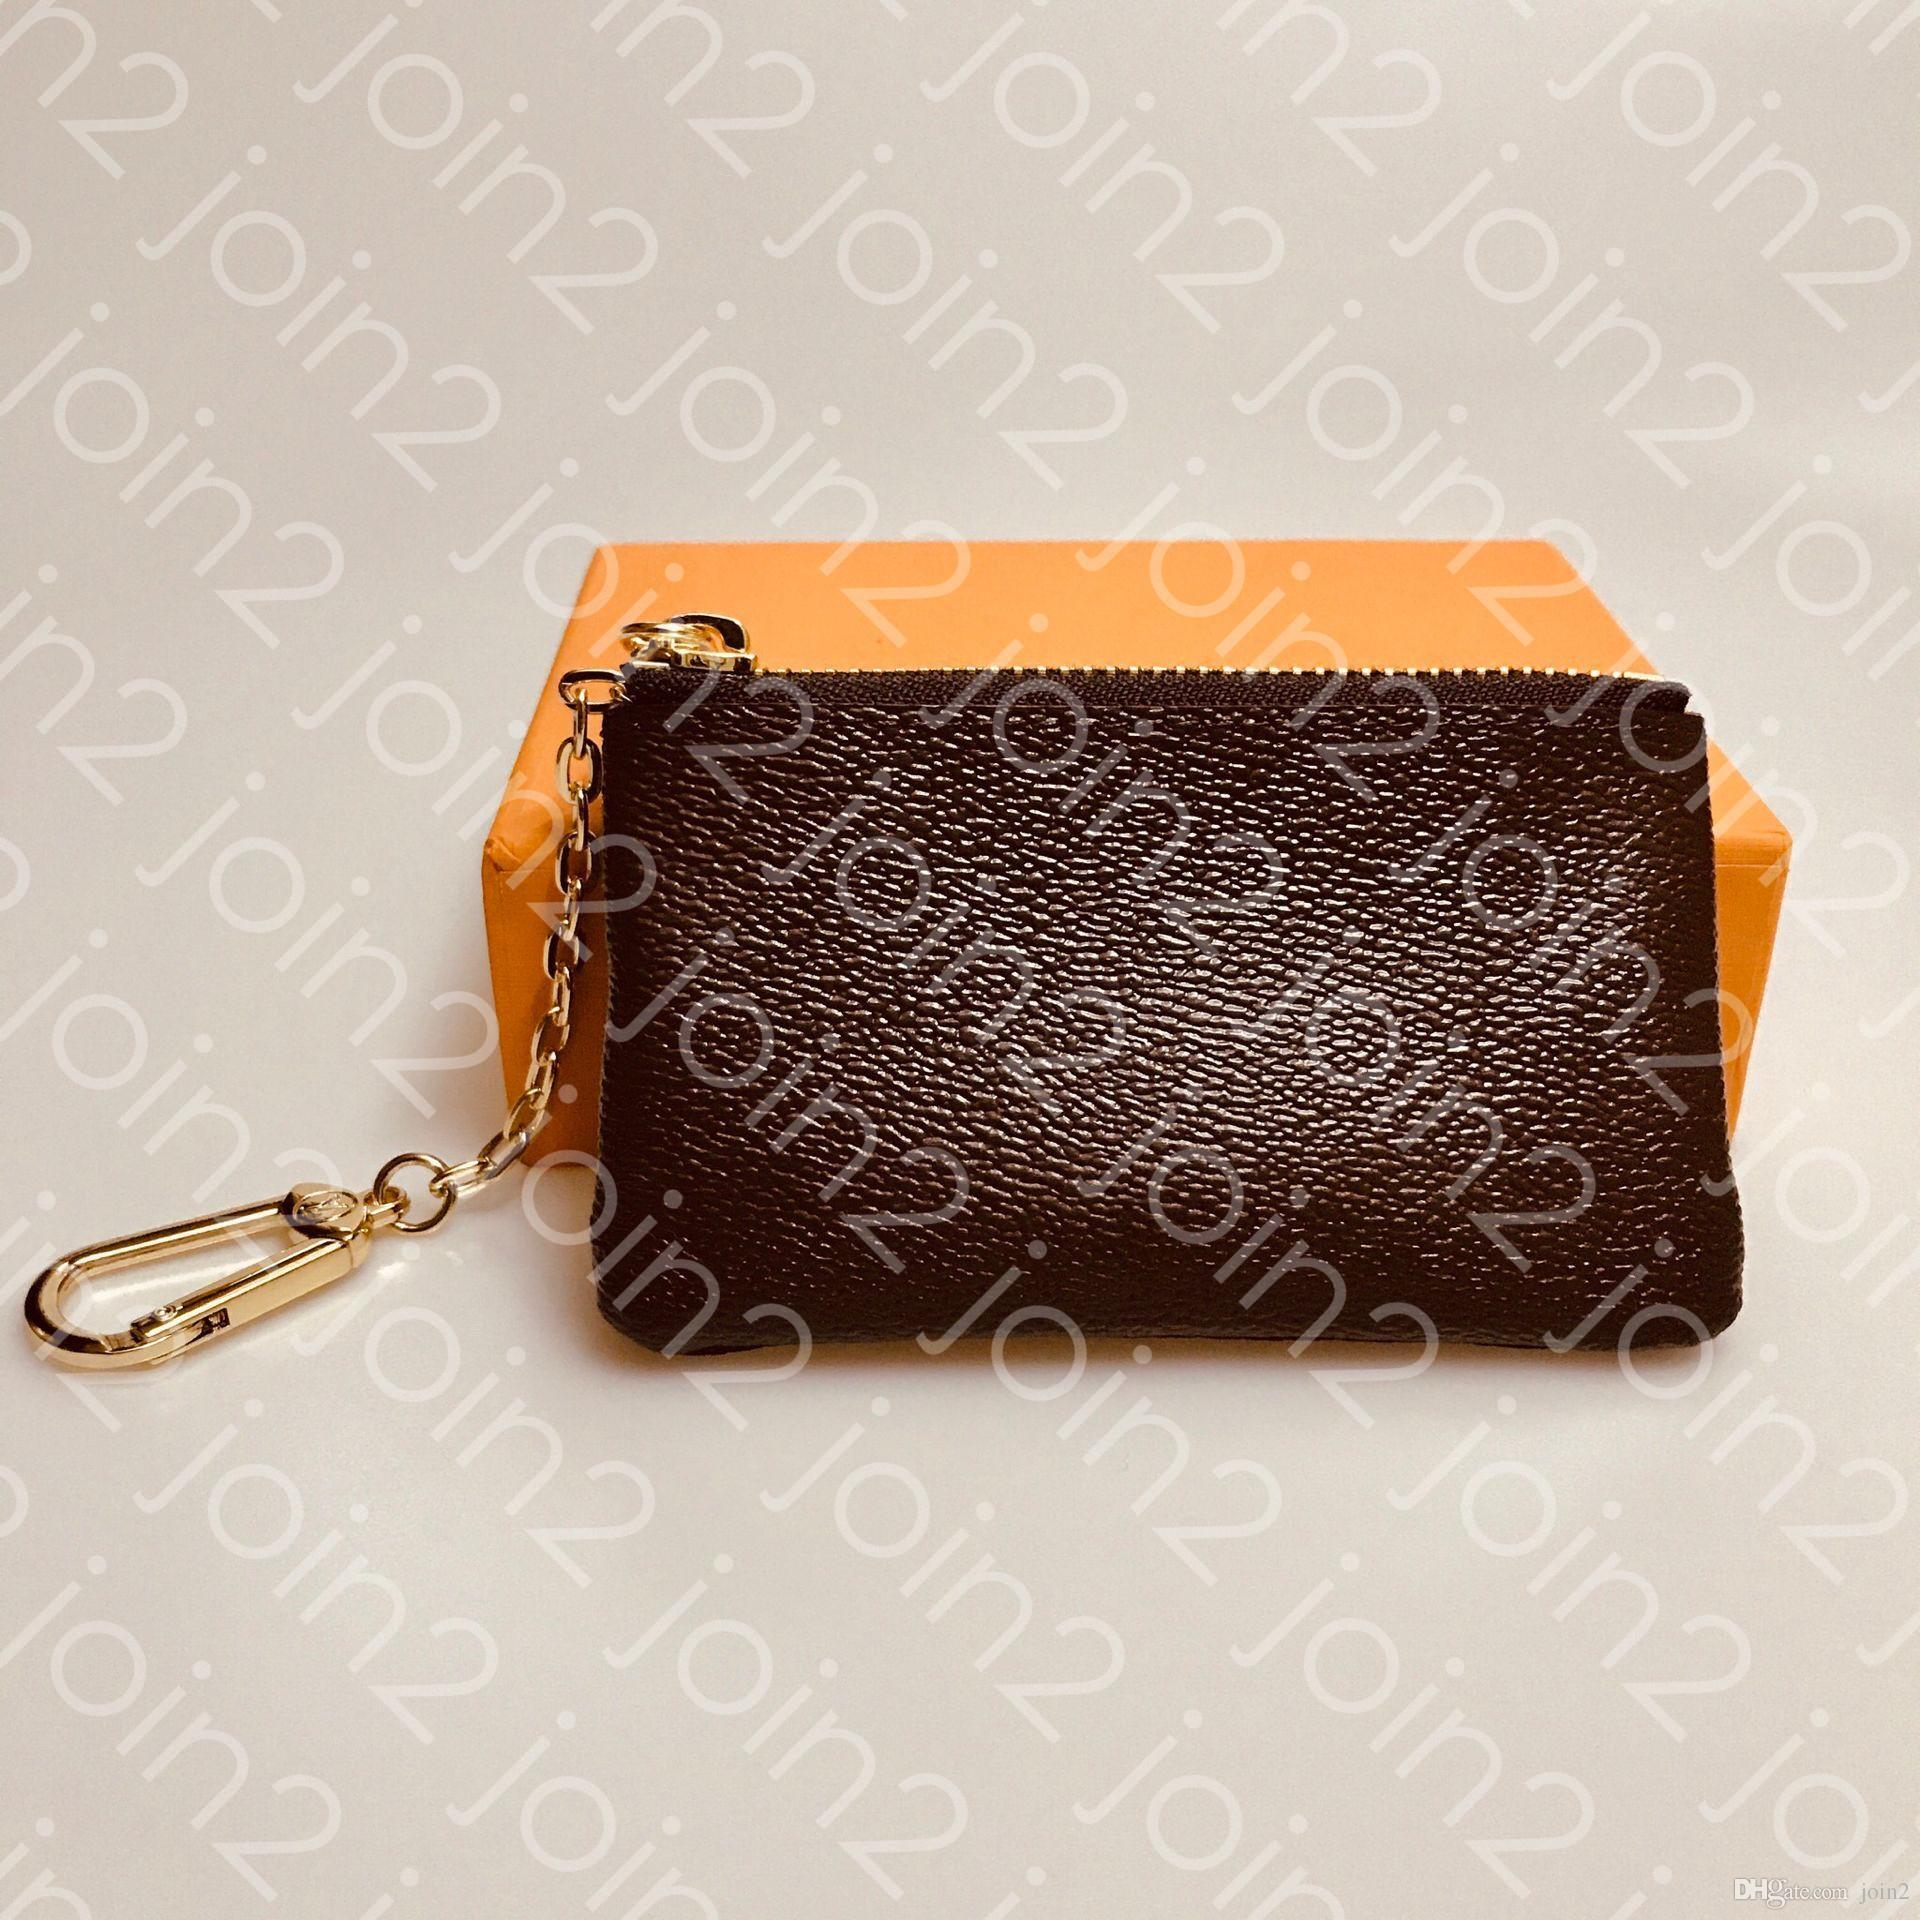 KEY POUCH M62650 POCHETTE CLES Designer Fashion Womens Mens Key Ring Credit Card Holder Coin Purse Luxury Mini Wallet Bag Charm Brown Canvas